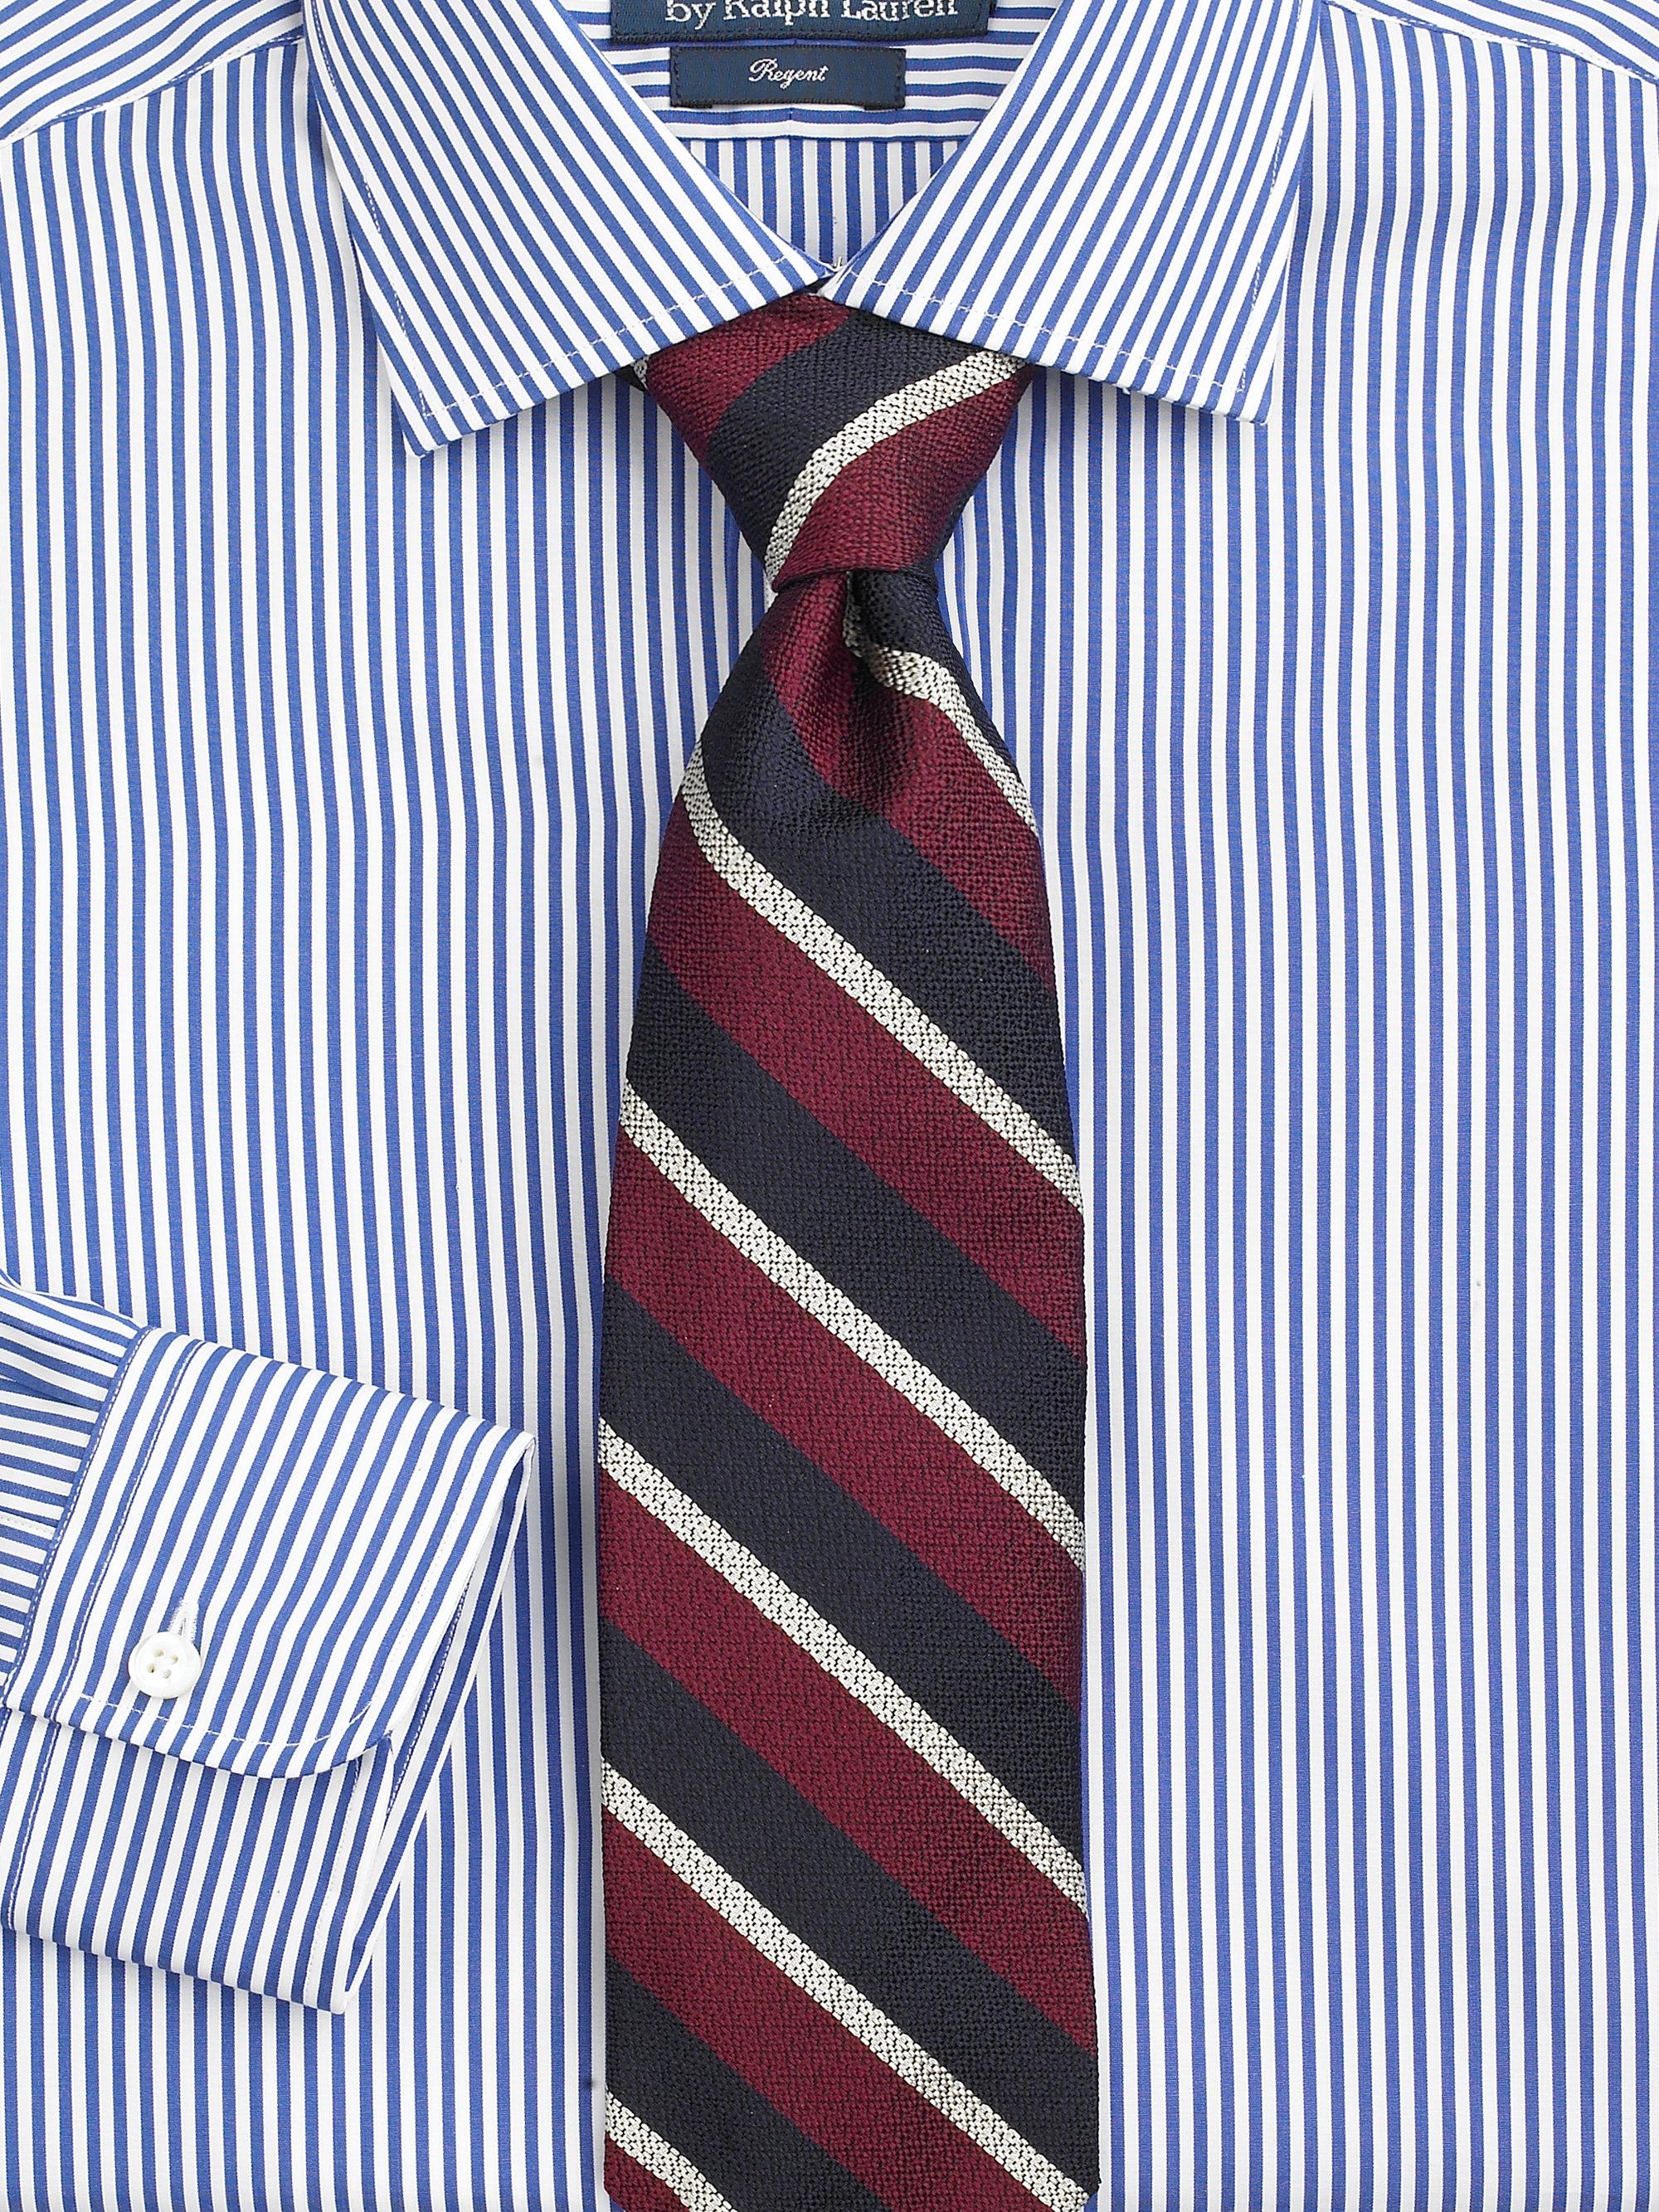 Lyst Polo Ralph Lauren Customfit Striped Regent Dress Shirt In